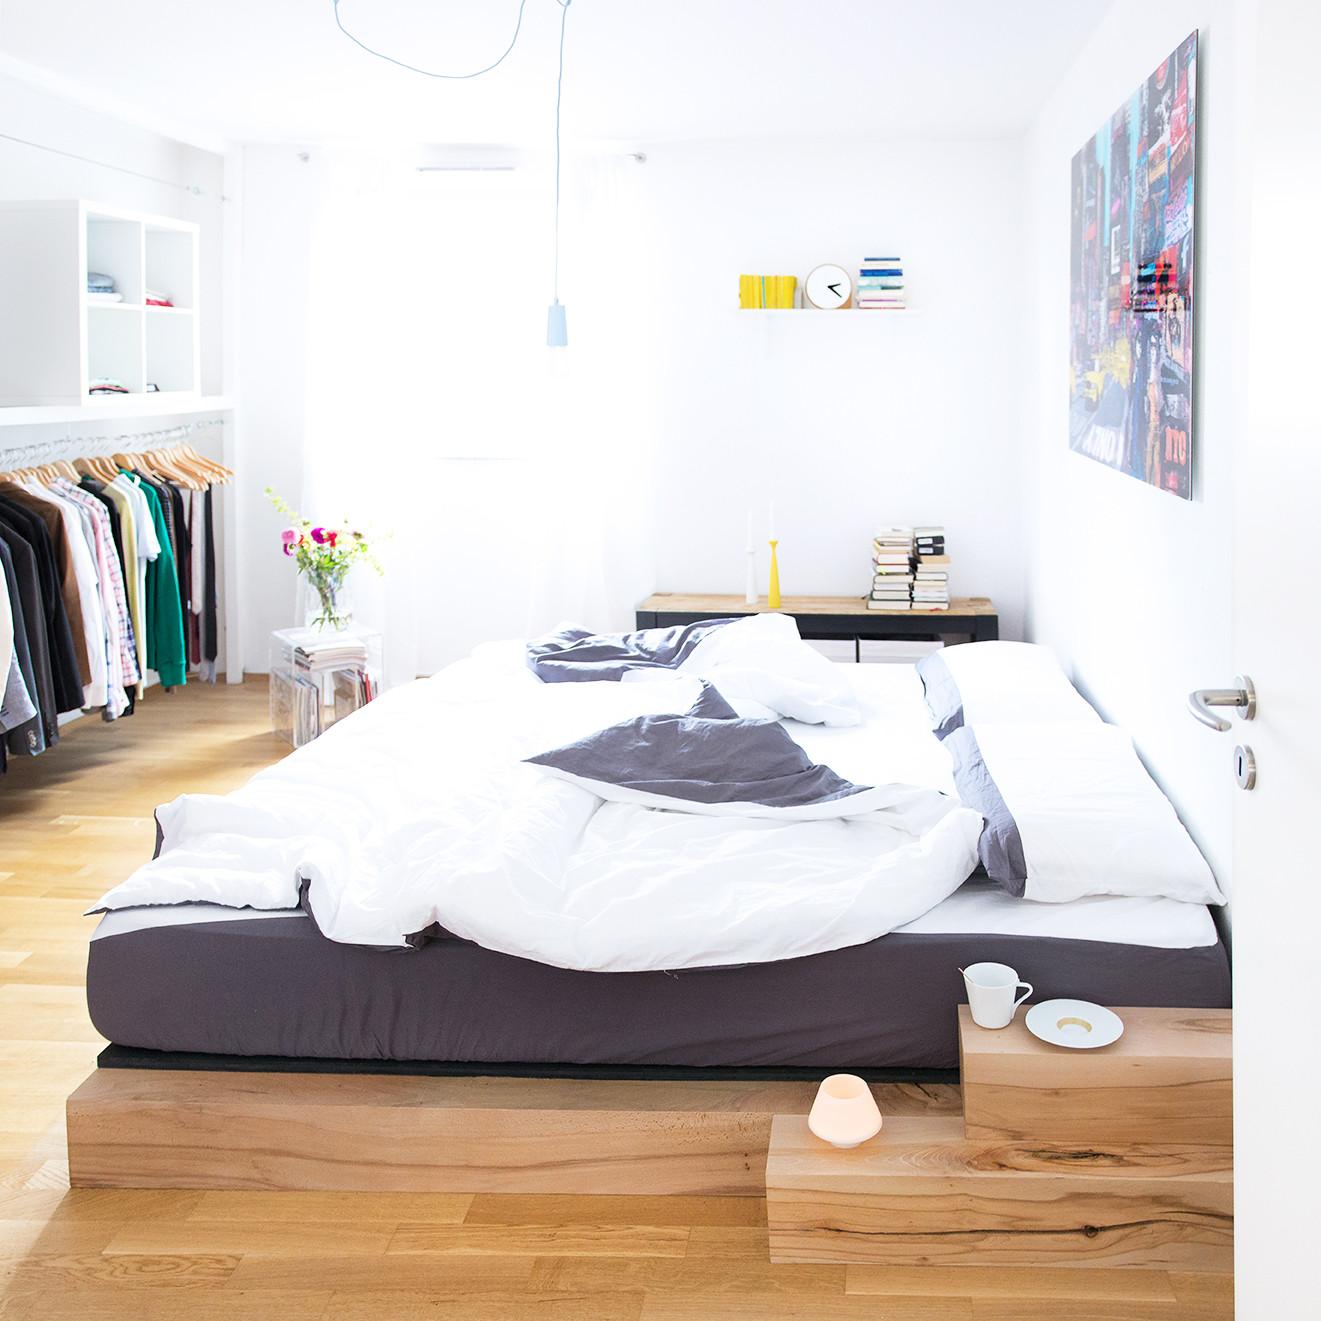 Diy Betten  DIY Bett Anleitung zum selber bauen eines Massiv Holz Bettes